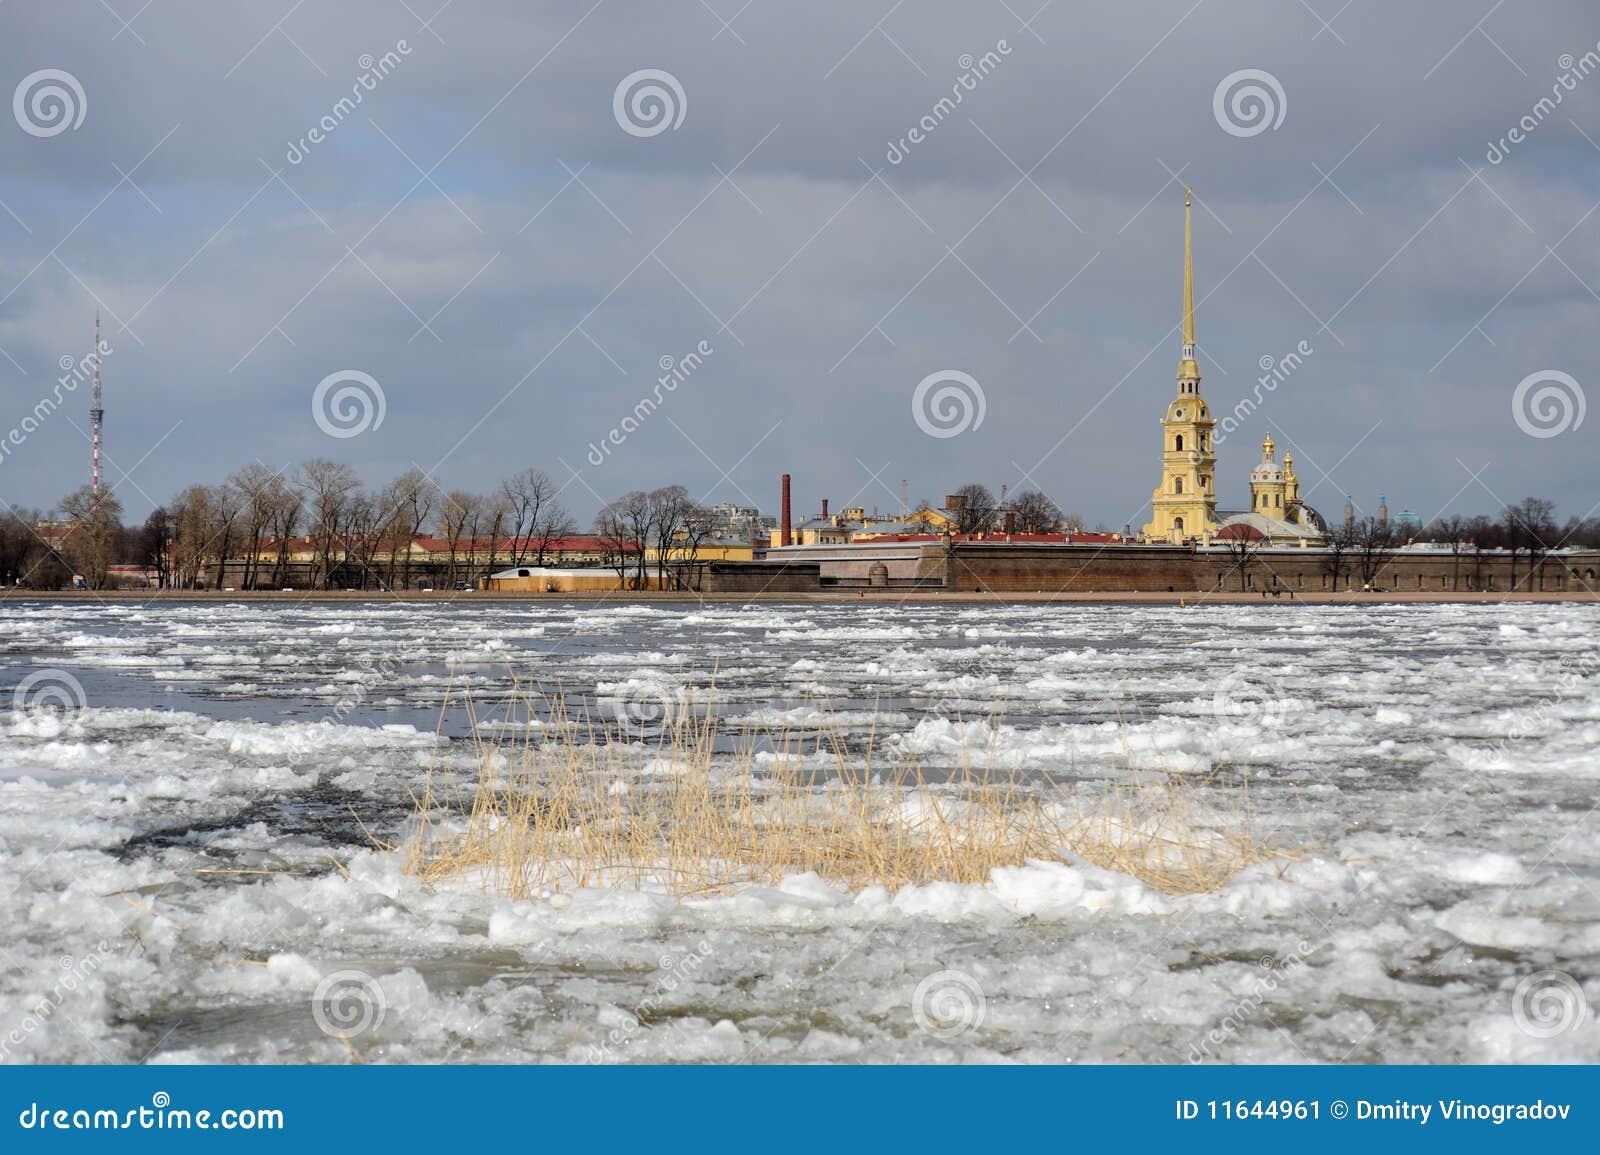 Debaclenevaflod